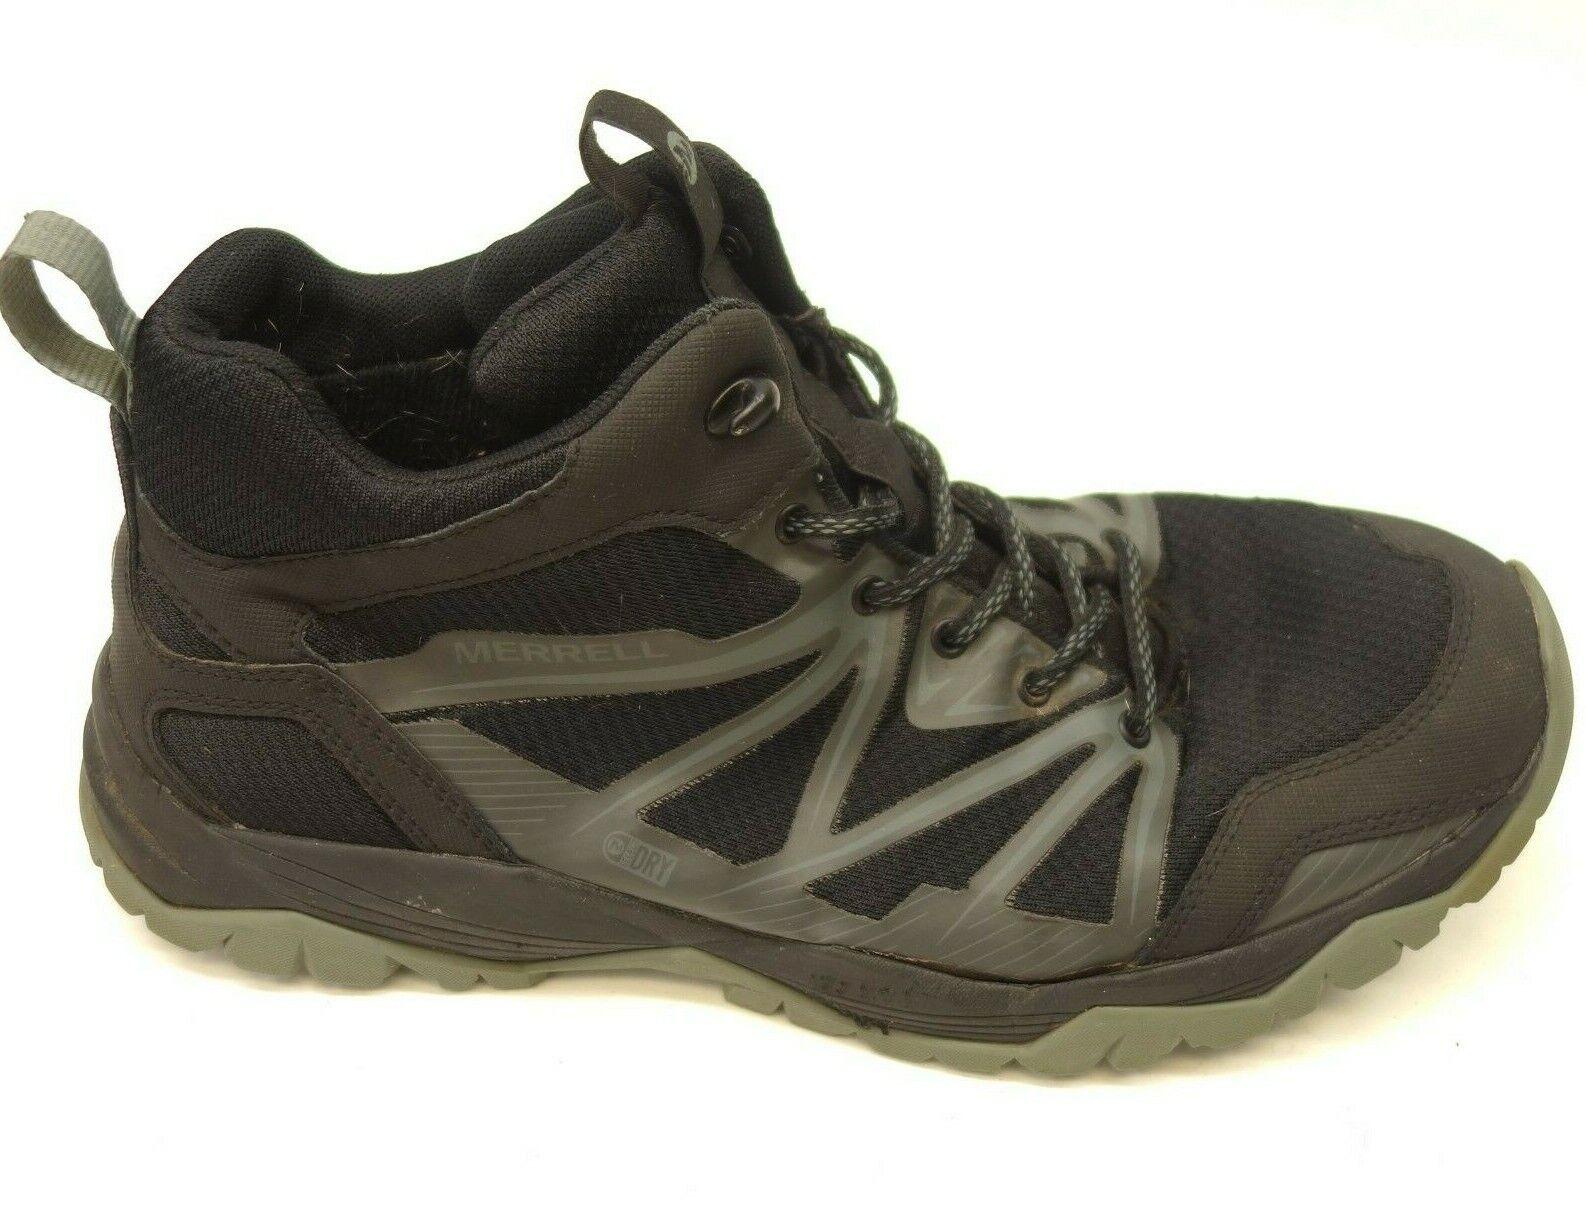 Merrell Capra aumento Medio Gore-Tex botas Para Excursionismo trail para hombre Atlético